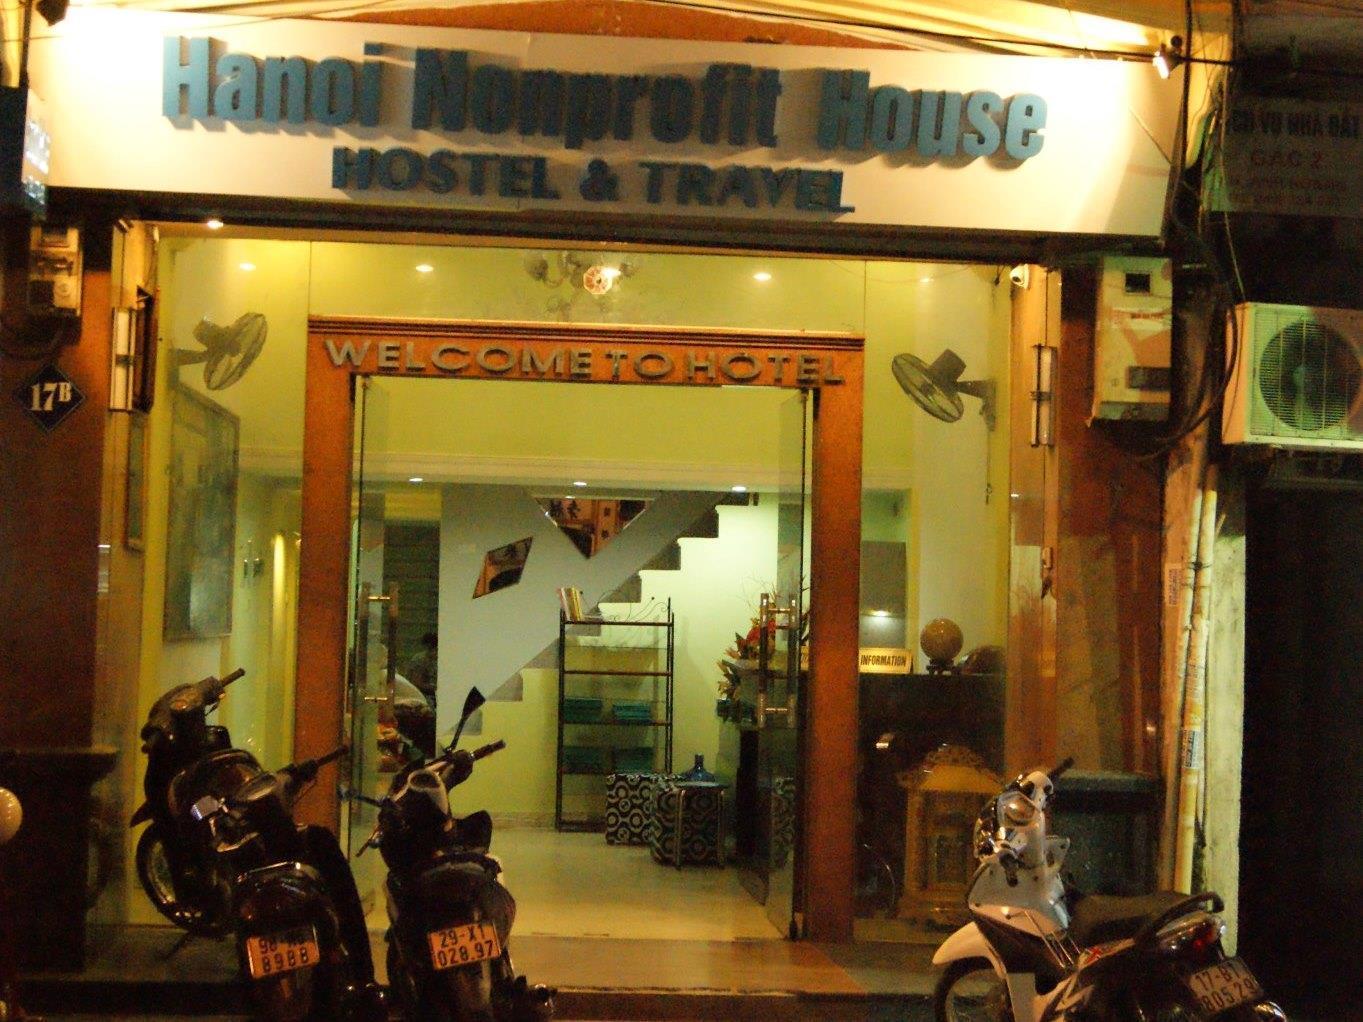 Hanoi Nonprofit House - Hotell och Boende i Vietnam , Hanoi